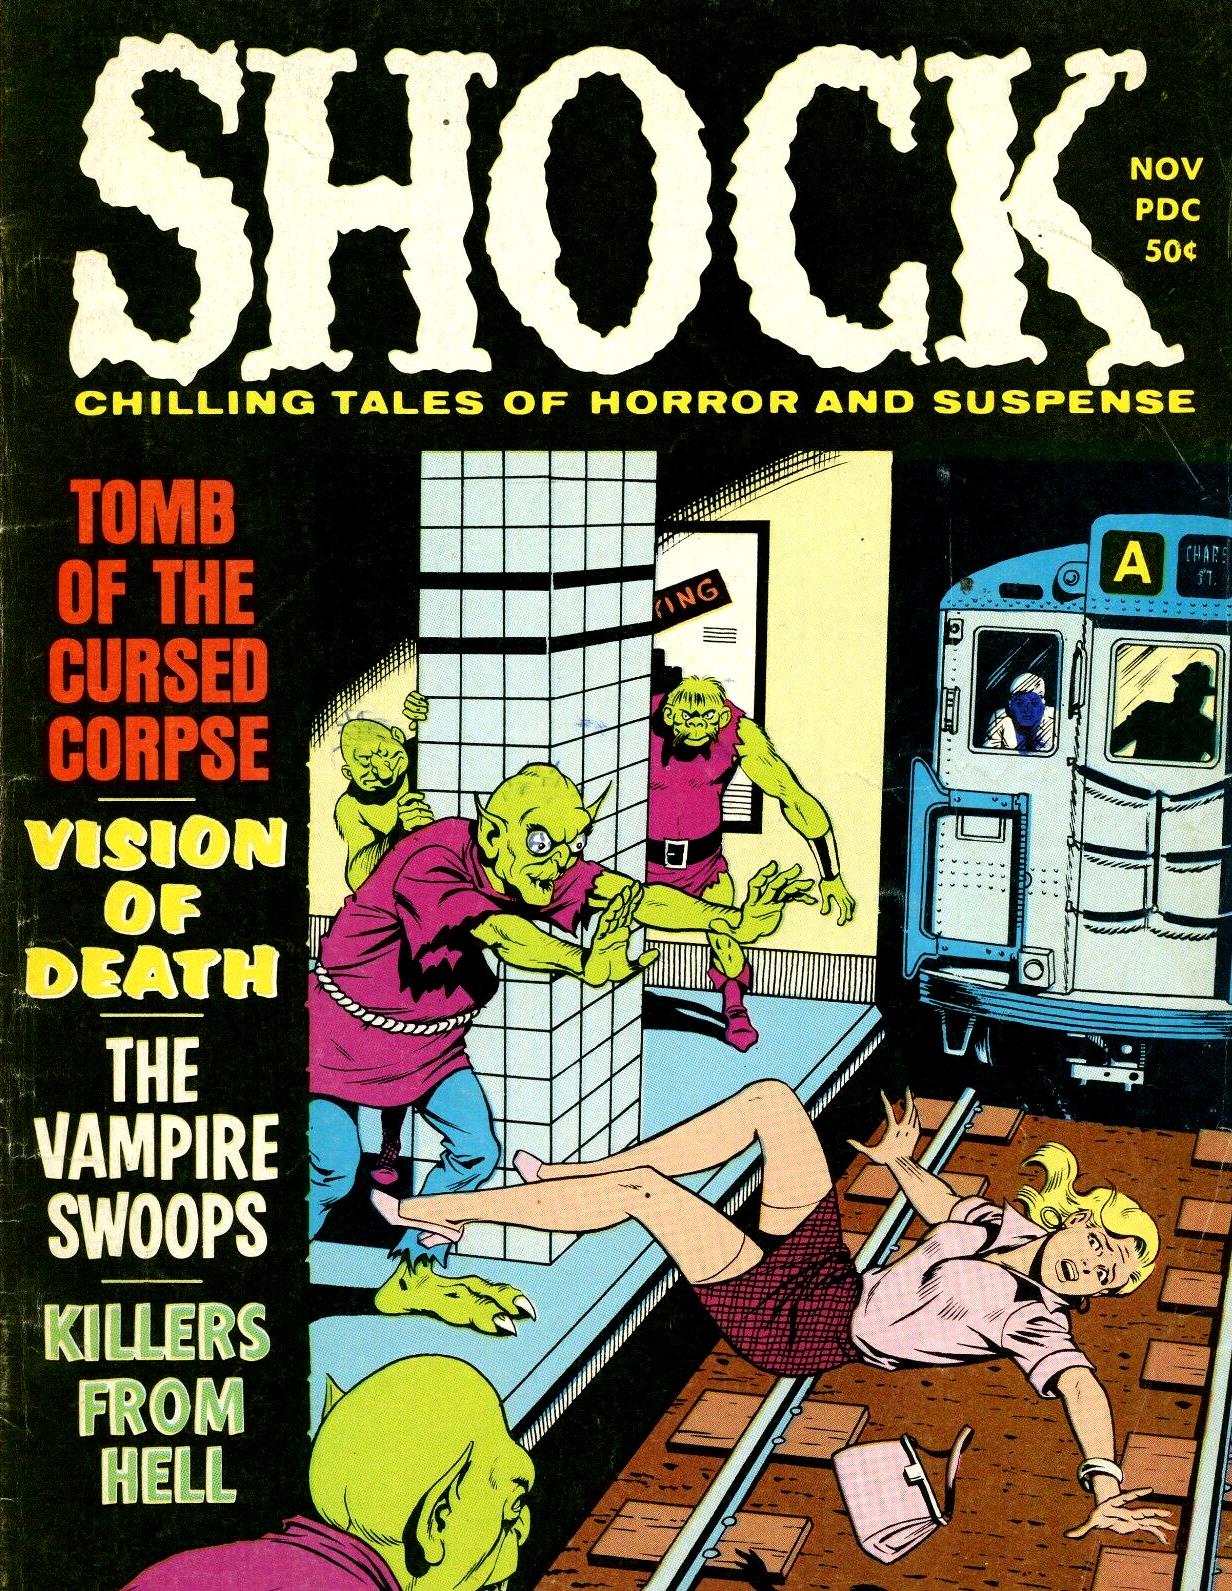 Shock - Volume 2, Issue 05, November 1970